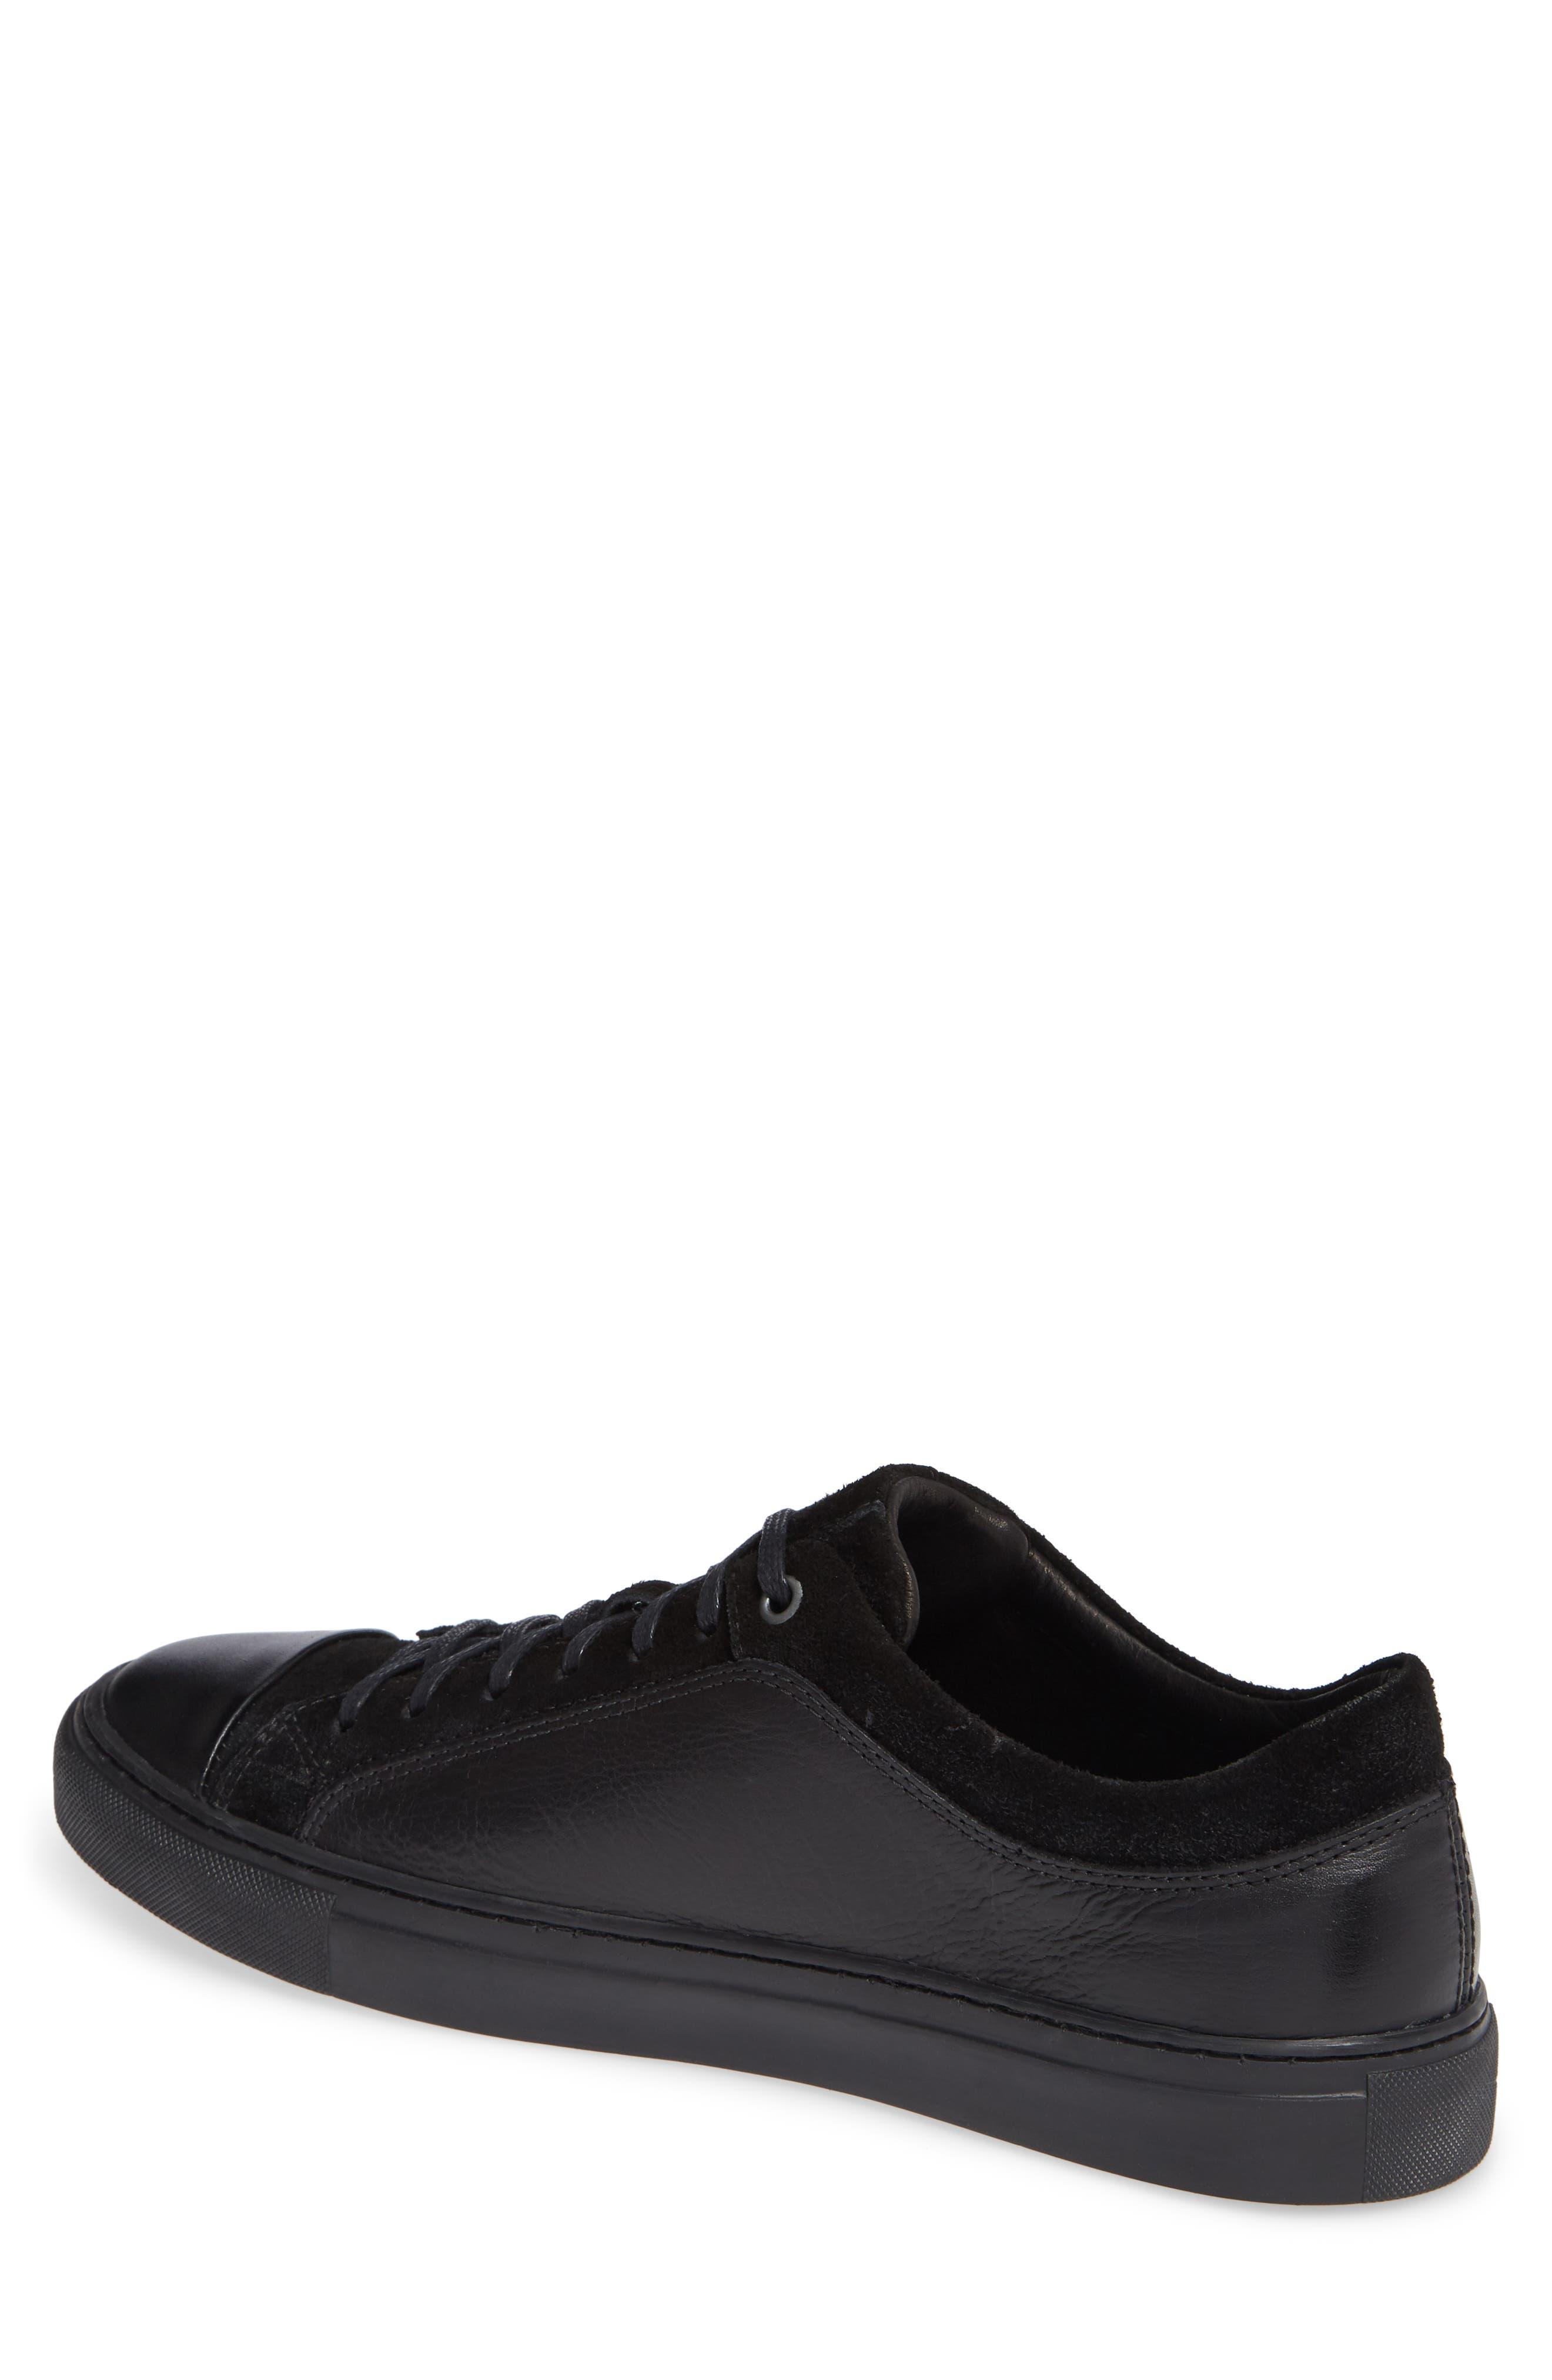 Berkeley Sneaker,                             Alternate thumbnail 2, color,                             BLACK